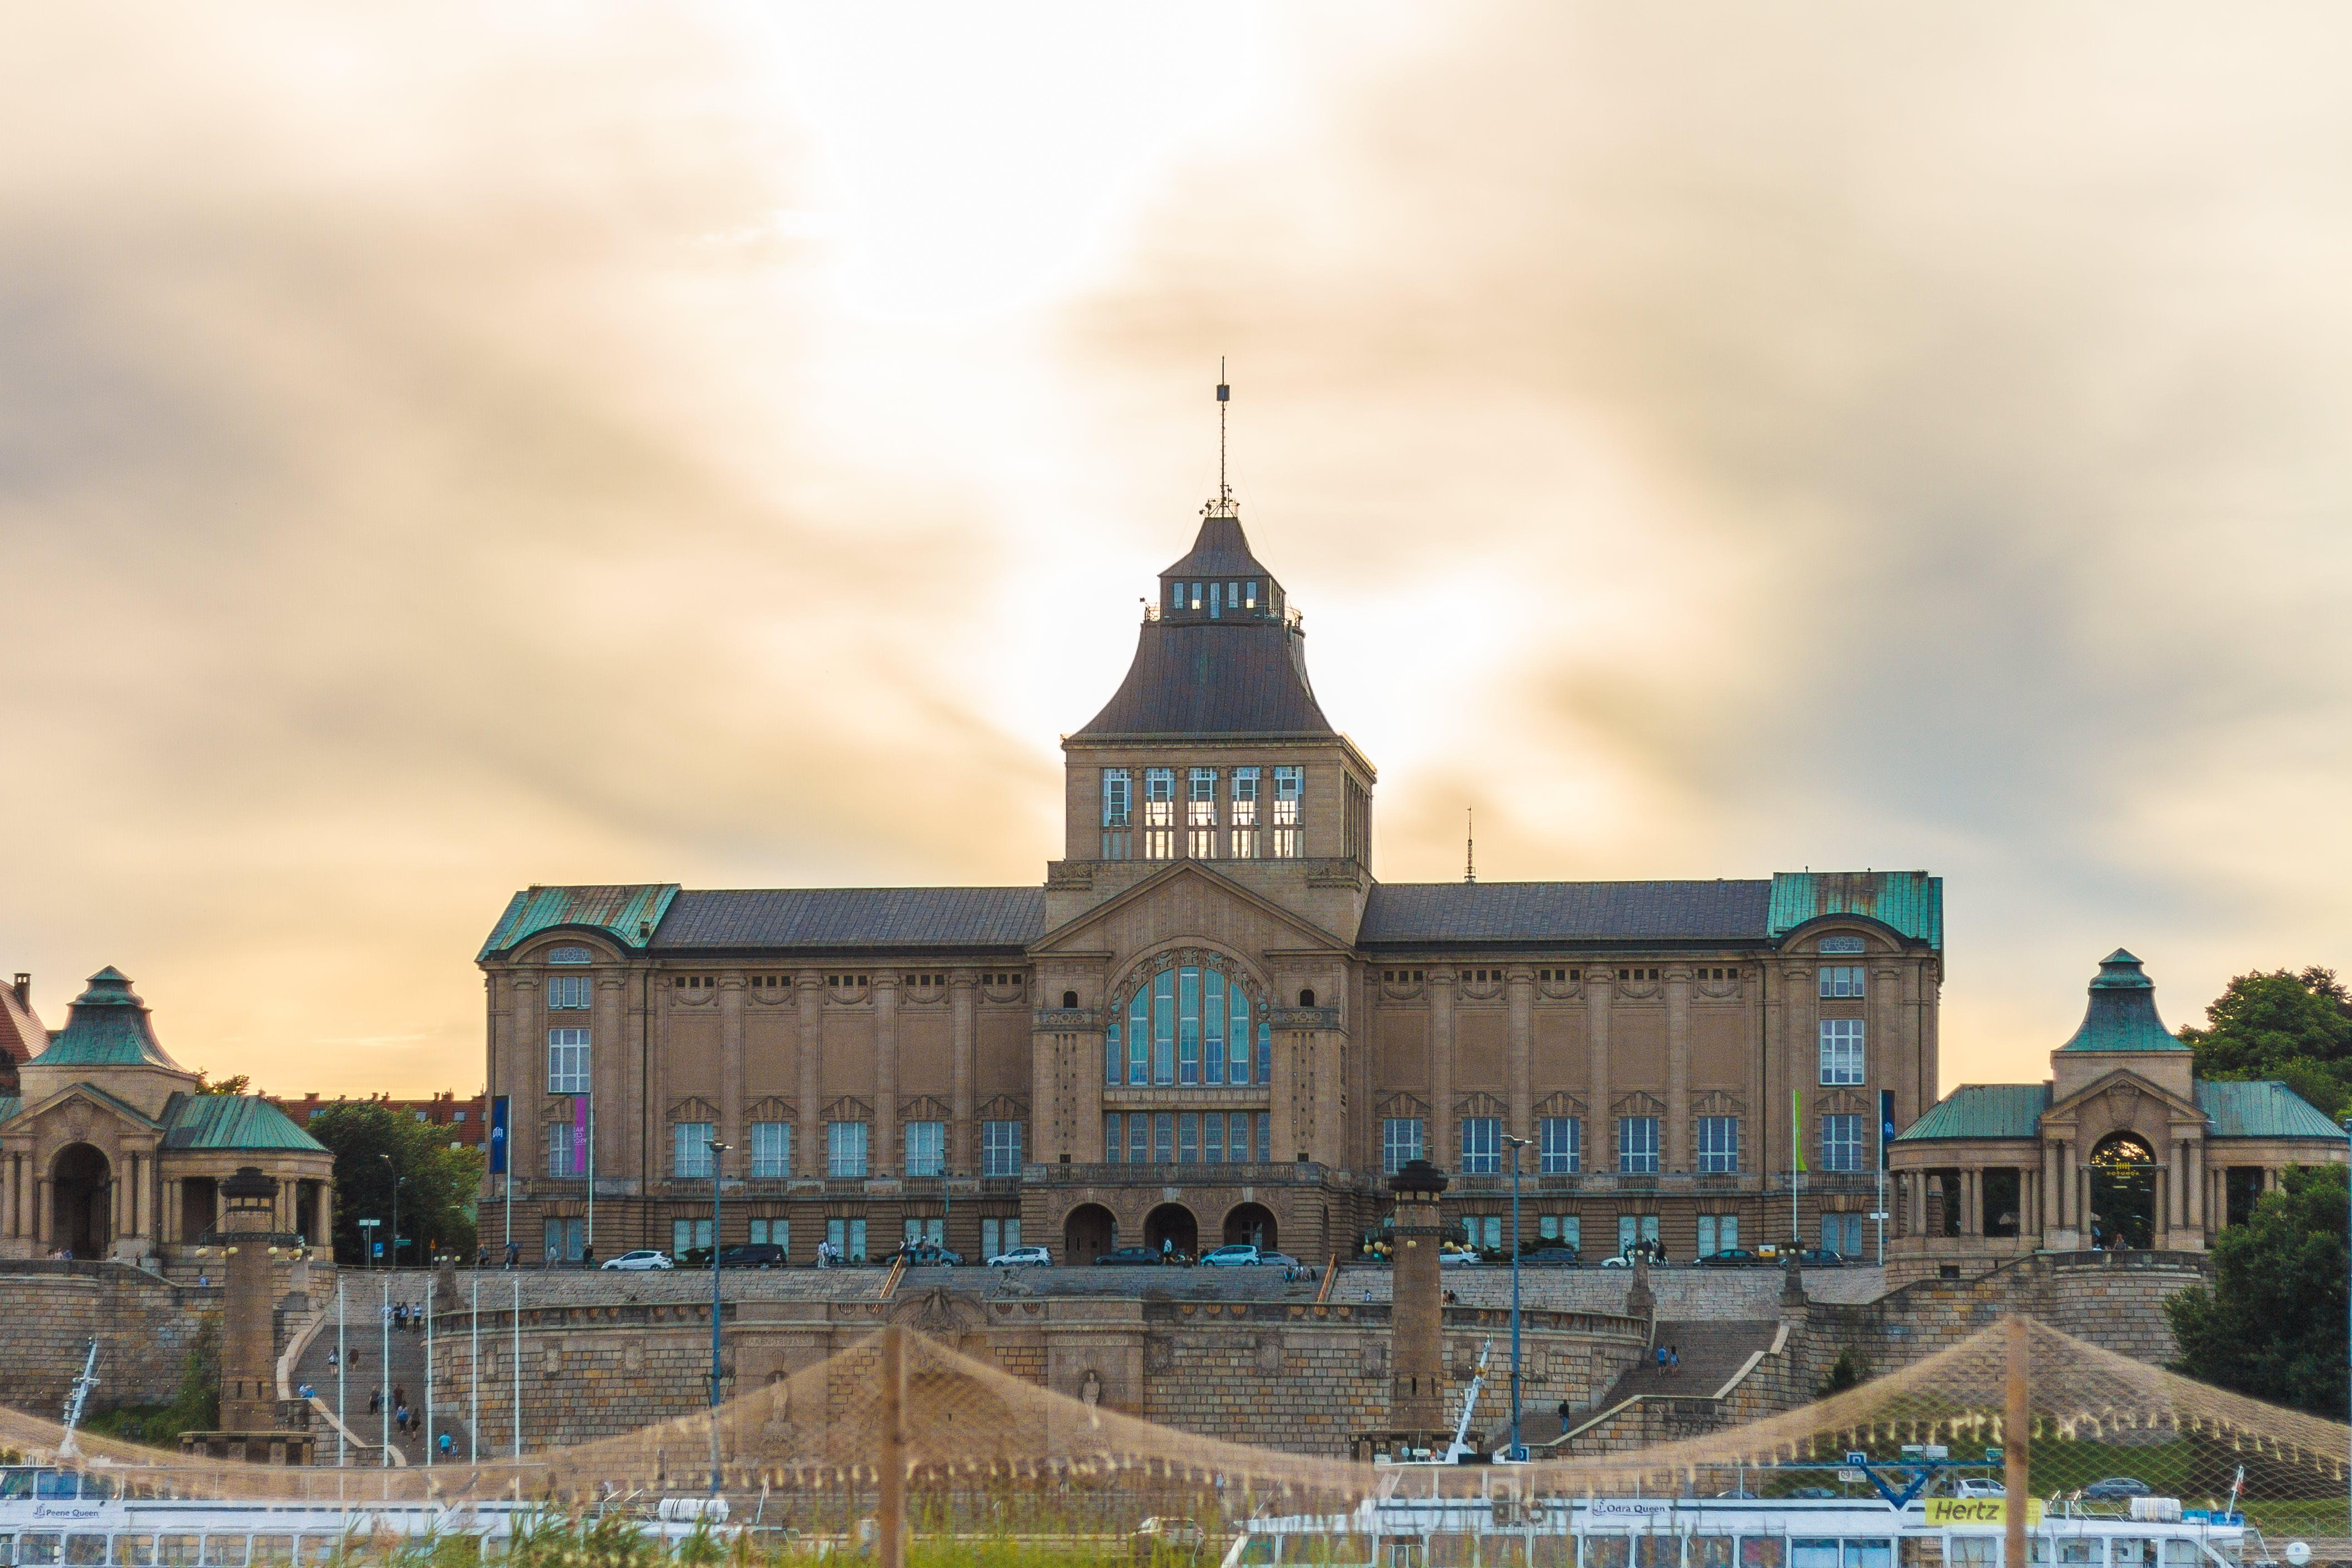 Free stock photo of building, Generallandschaftsgebäude, moody, palac